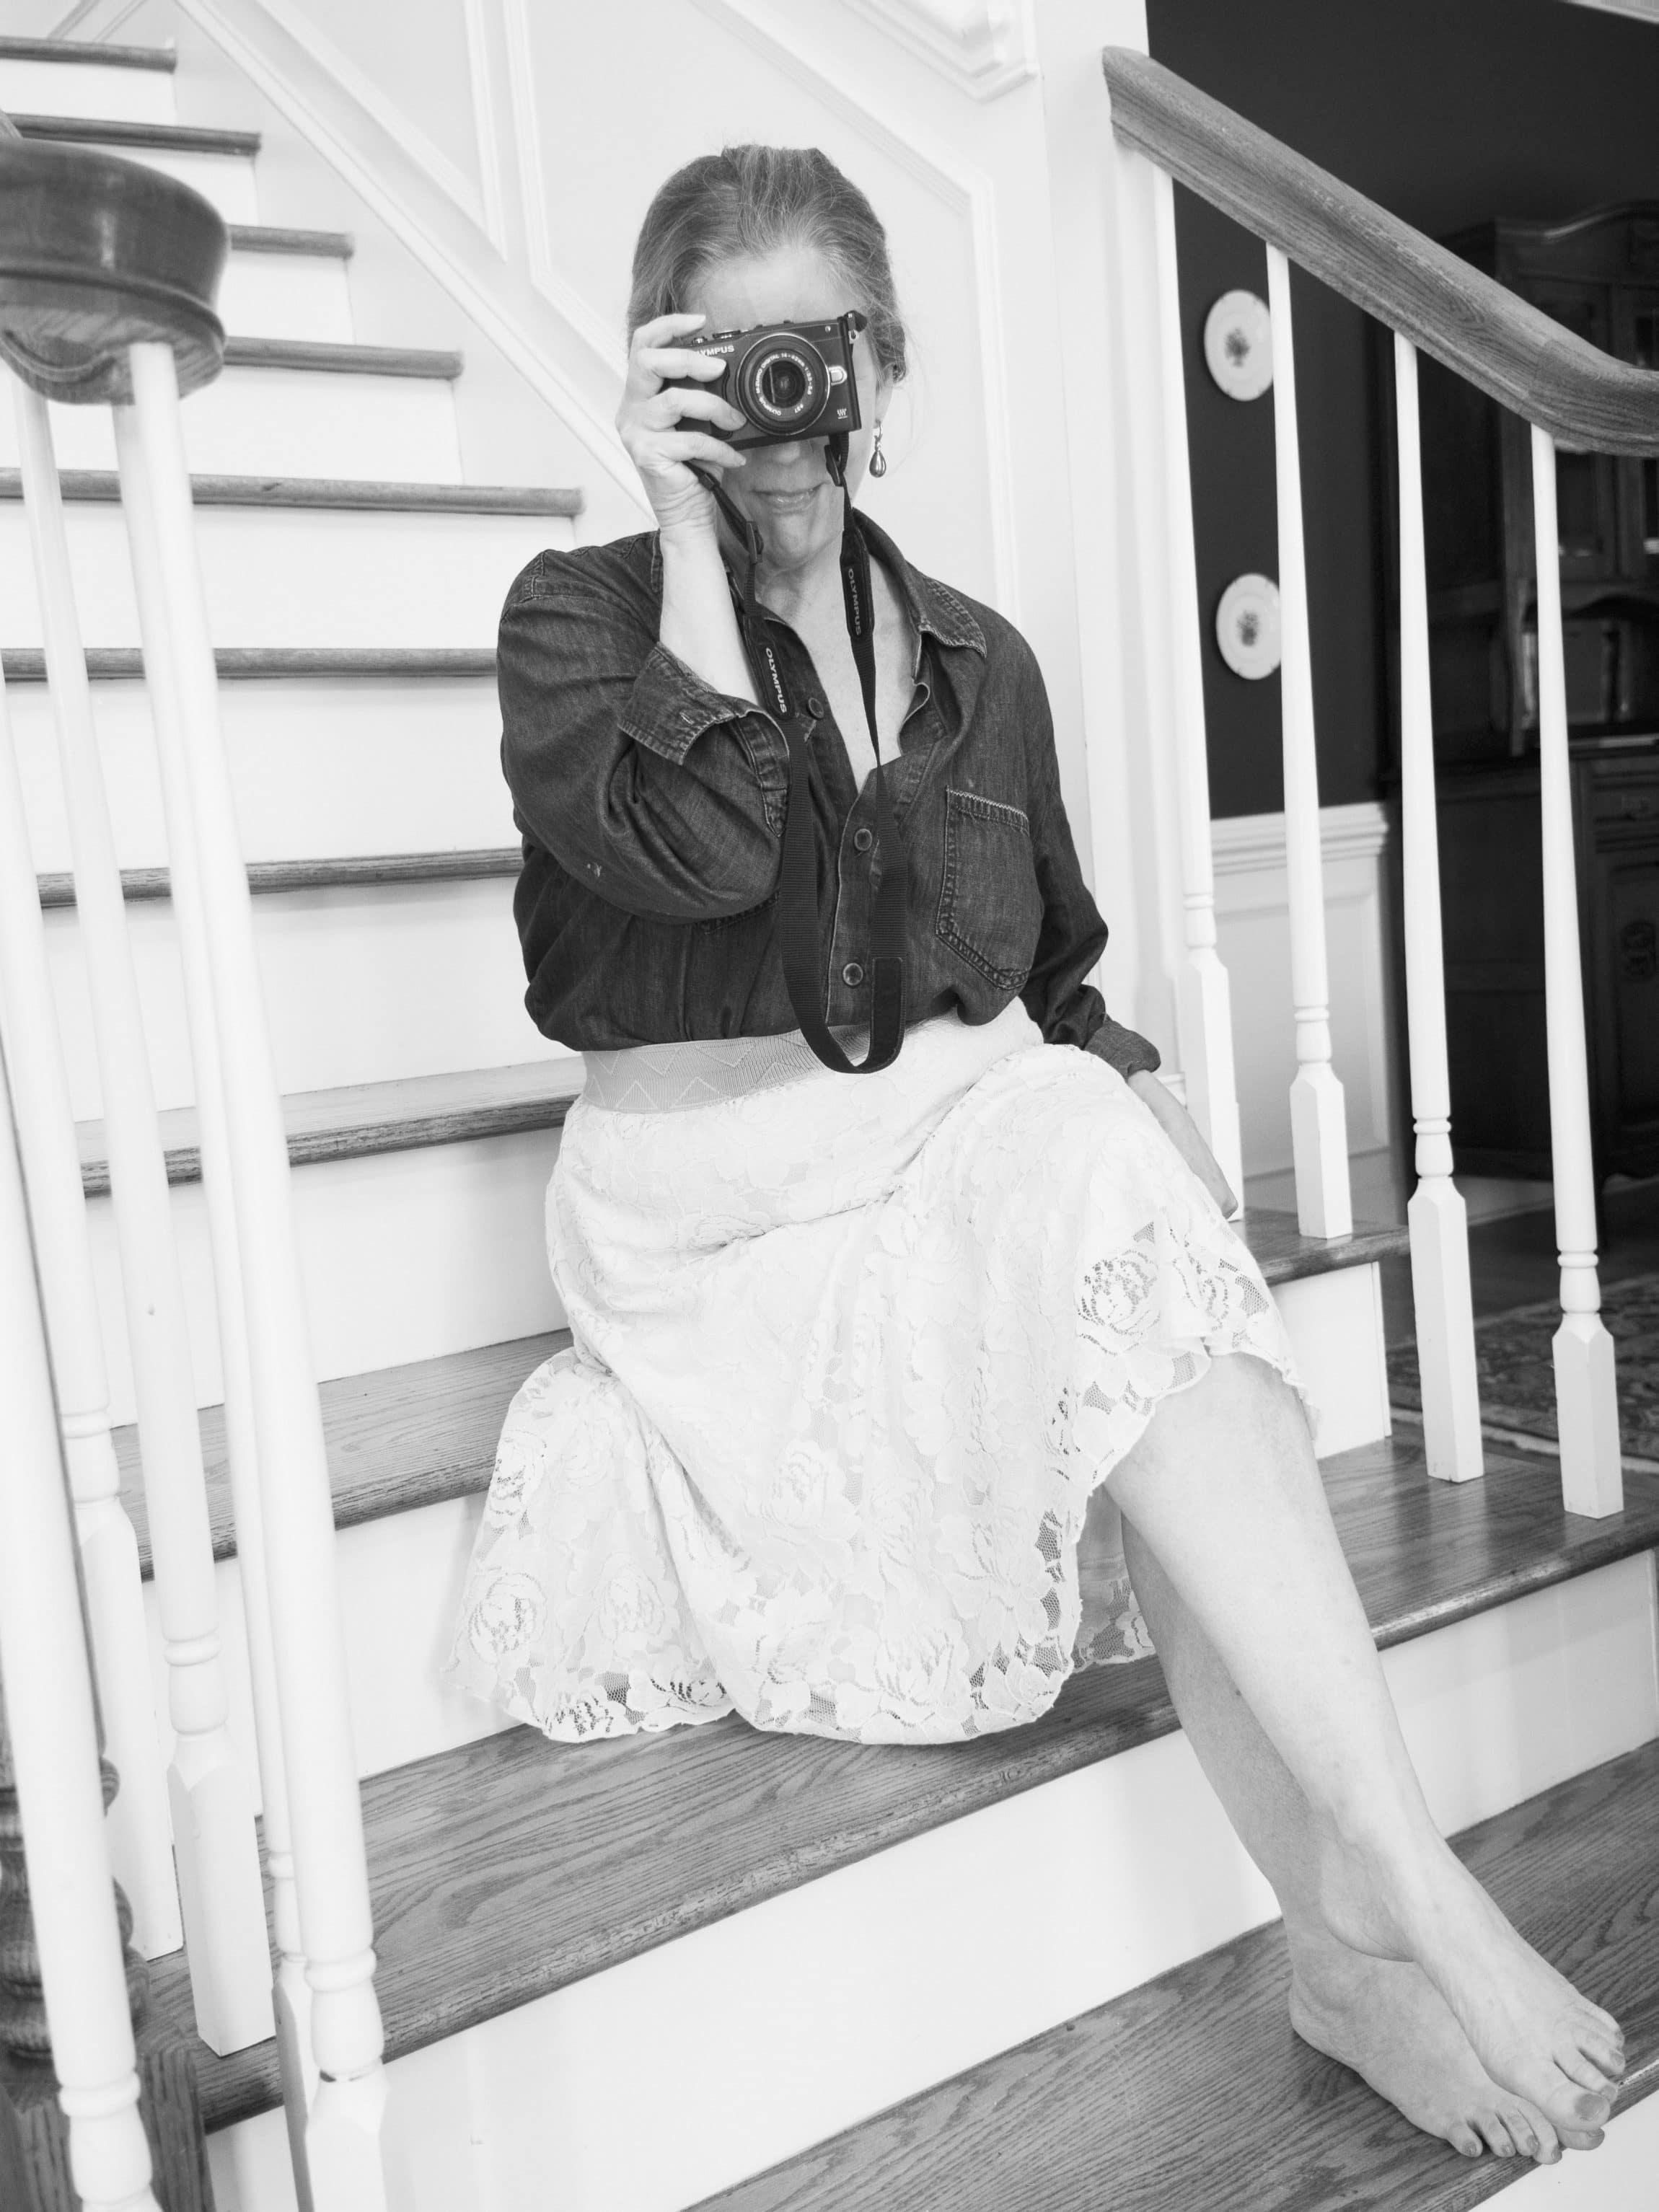 margo millure writer photographeer